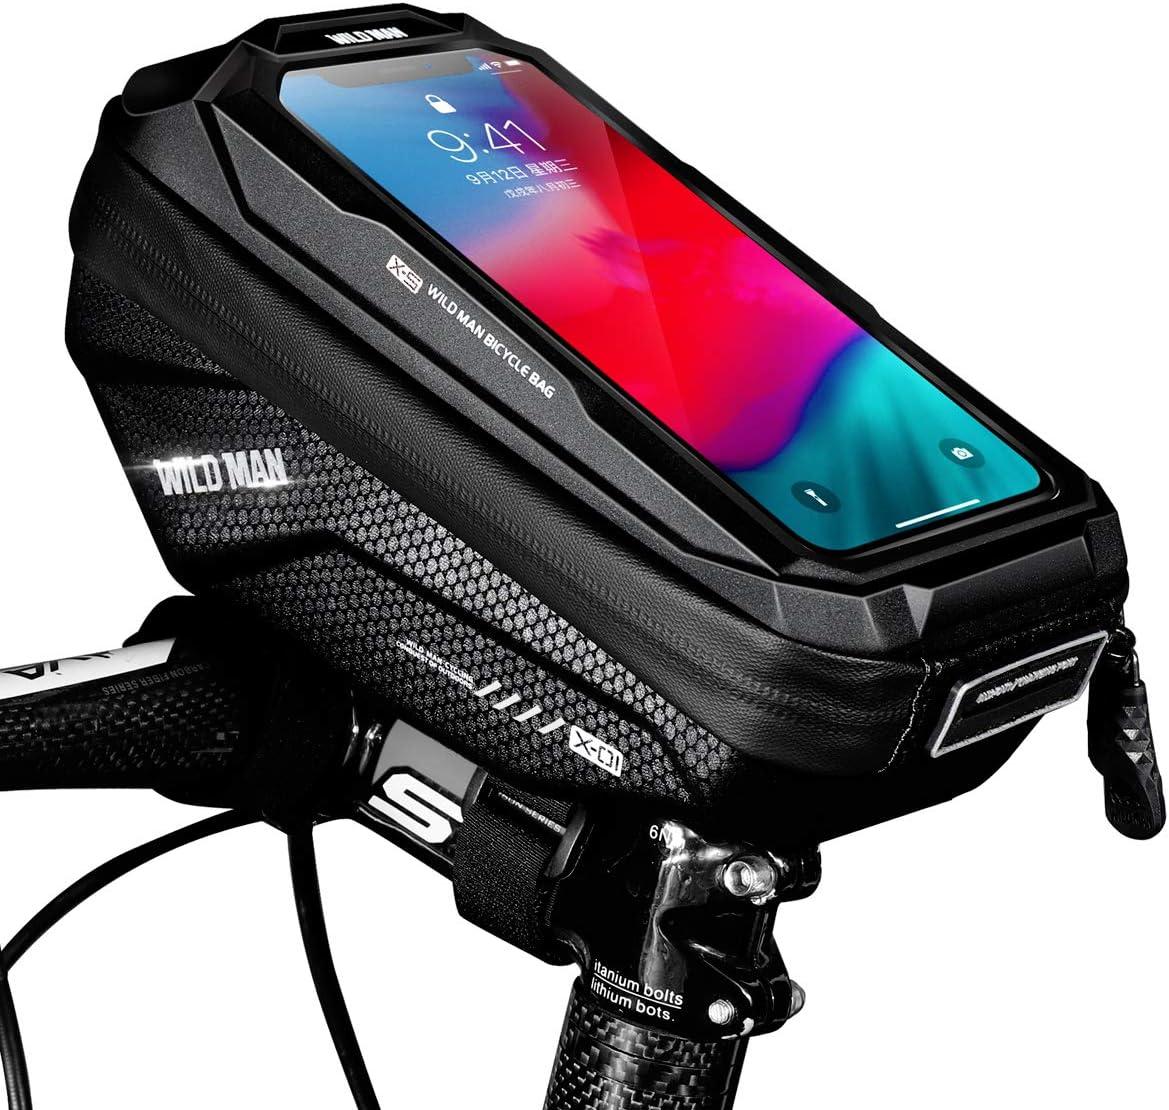 Faneam Bolsa Bicicleta Movil Impermeable Bolsa Bici Cuadro Manillar con Pantalla Táctil, Gran Capacidad Bolsas de Bicicleta Soporte Telefono Móvil para iPhone Samsung de hasta 6,5 Pulgadas